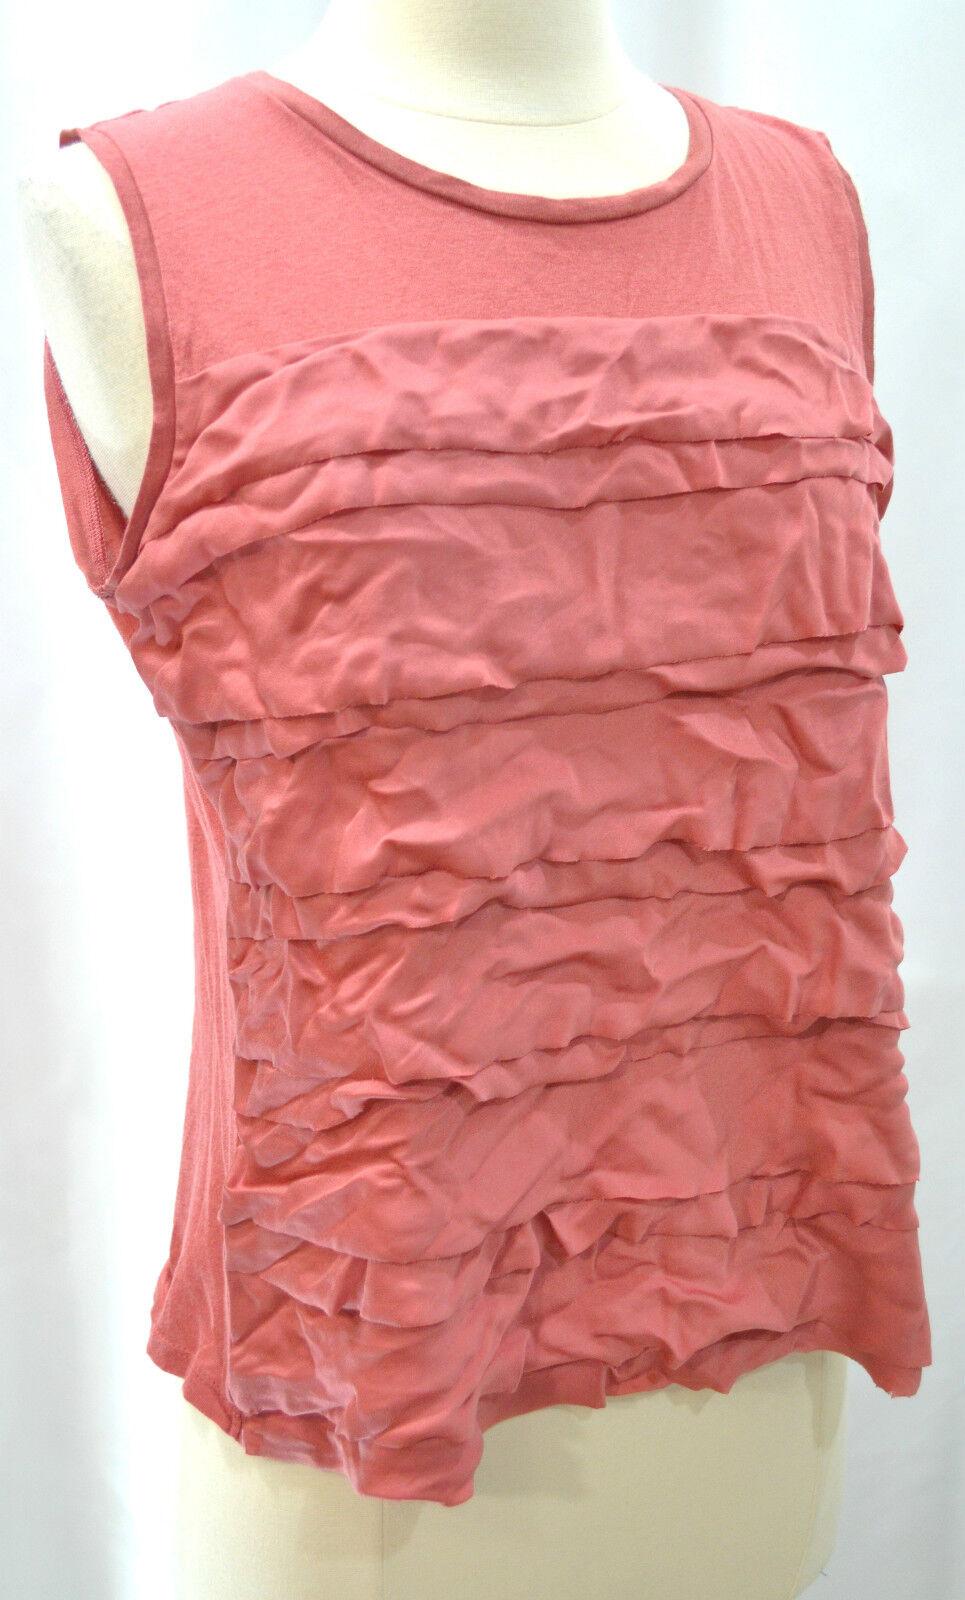 Ann Taylor blouse cotton modal ruffle tee feminine Cami knit Top shirt Size M